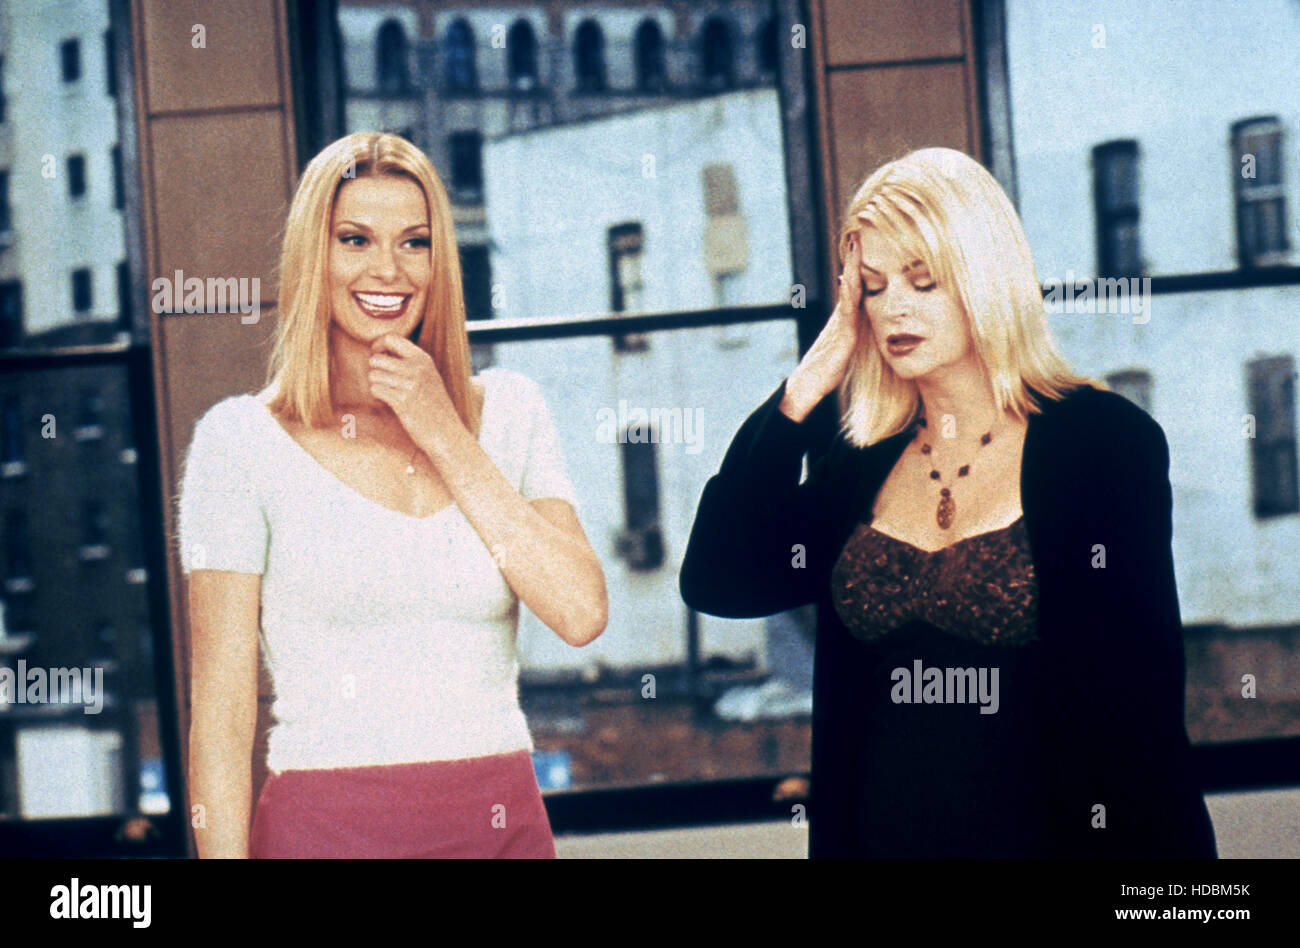 Toby Hemingway (born 1983),Mariella Lotti Hot pic Emma Rigby (born 1989),Skyler Samuels